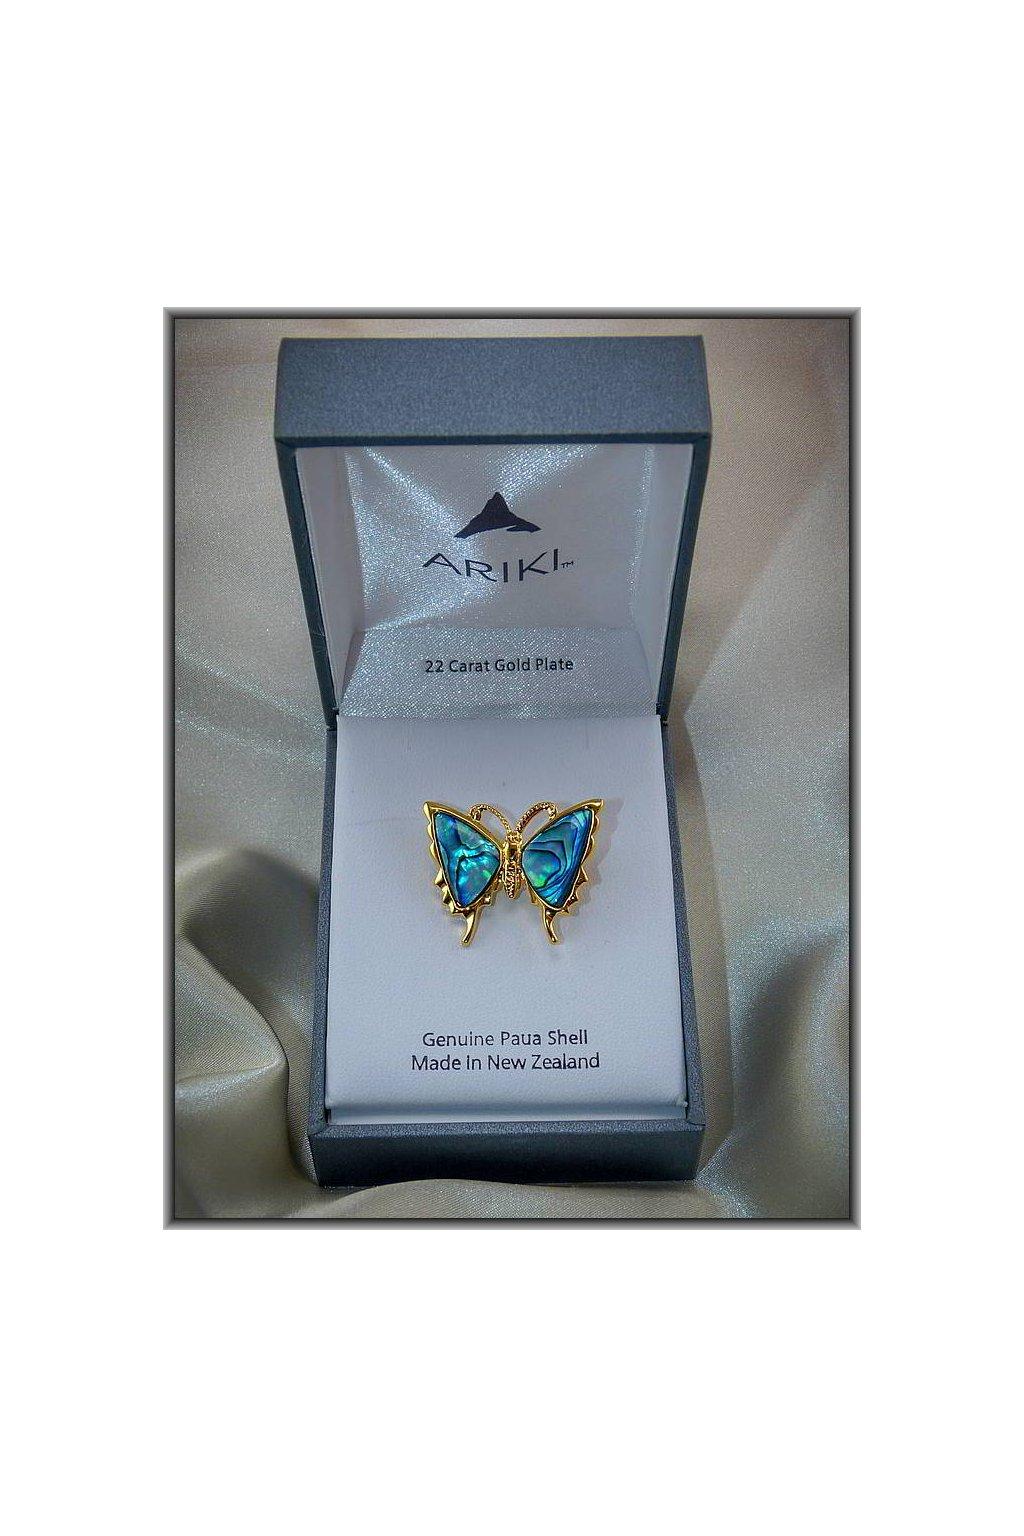 wbgarden ariki brož motýl malý gold plate